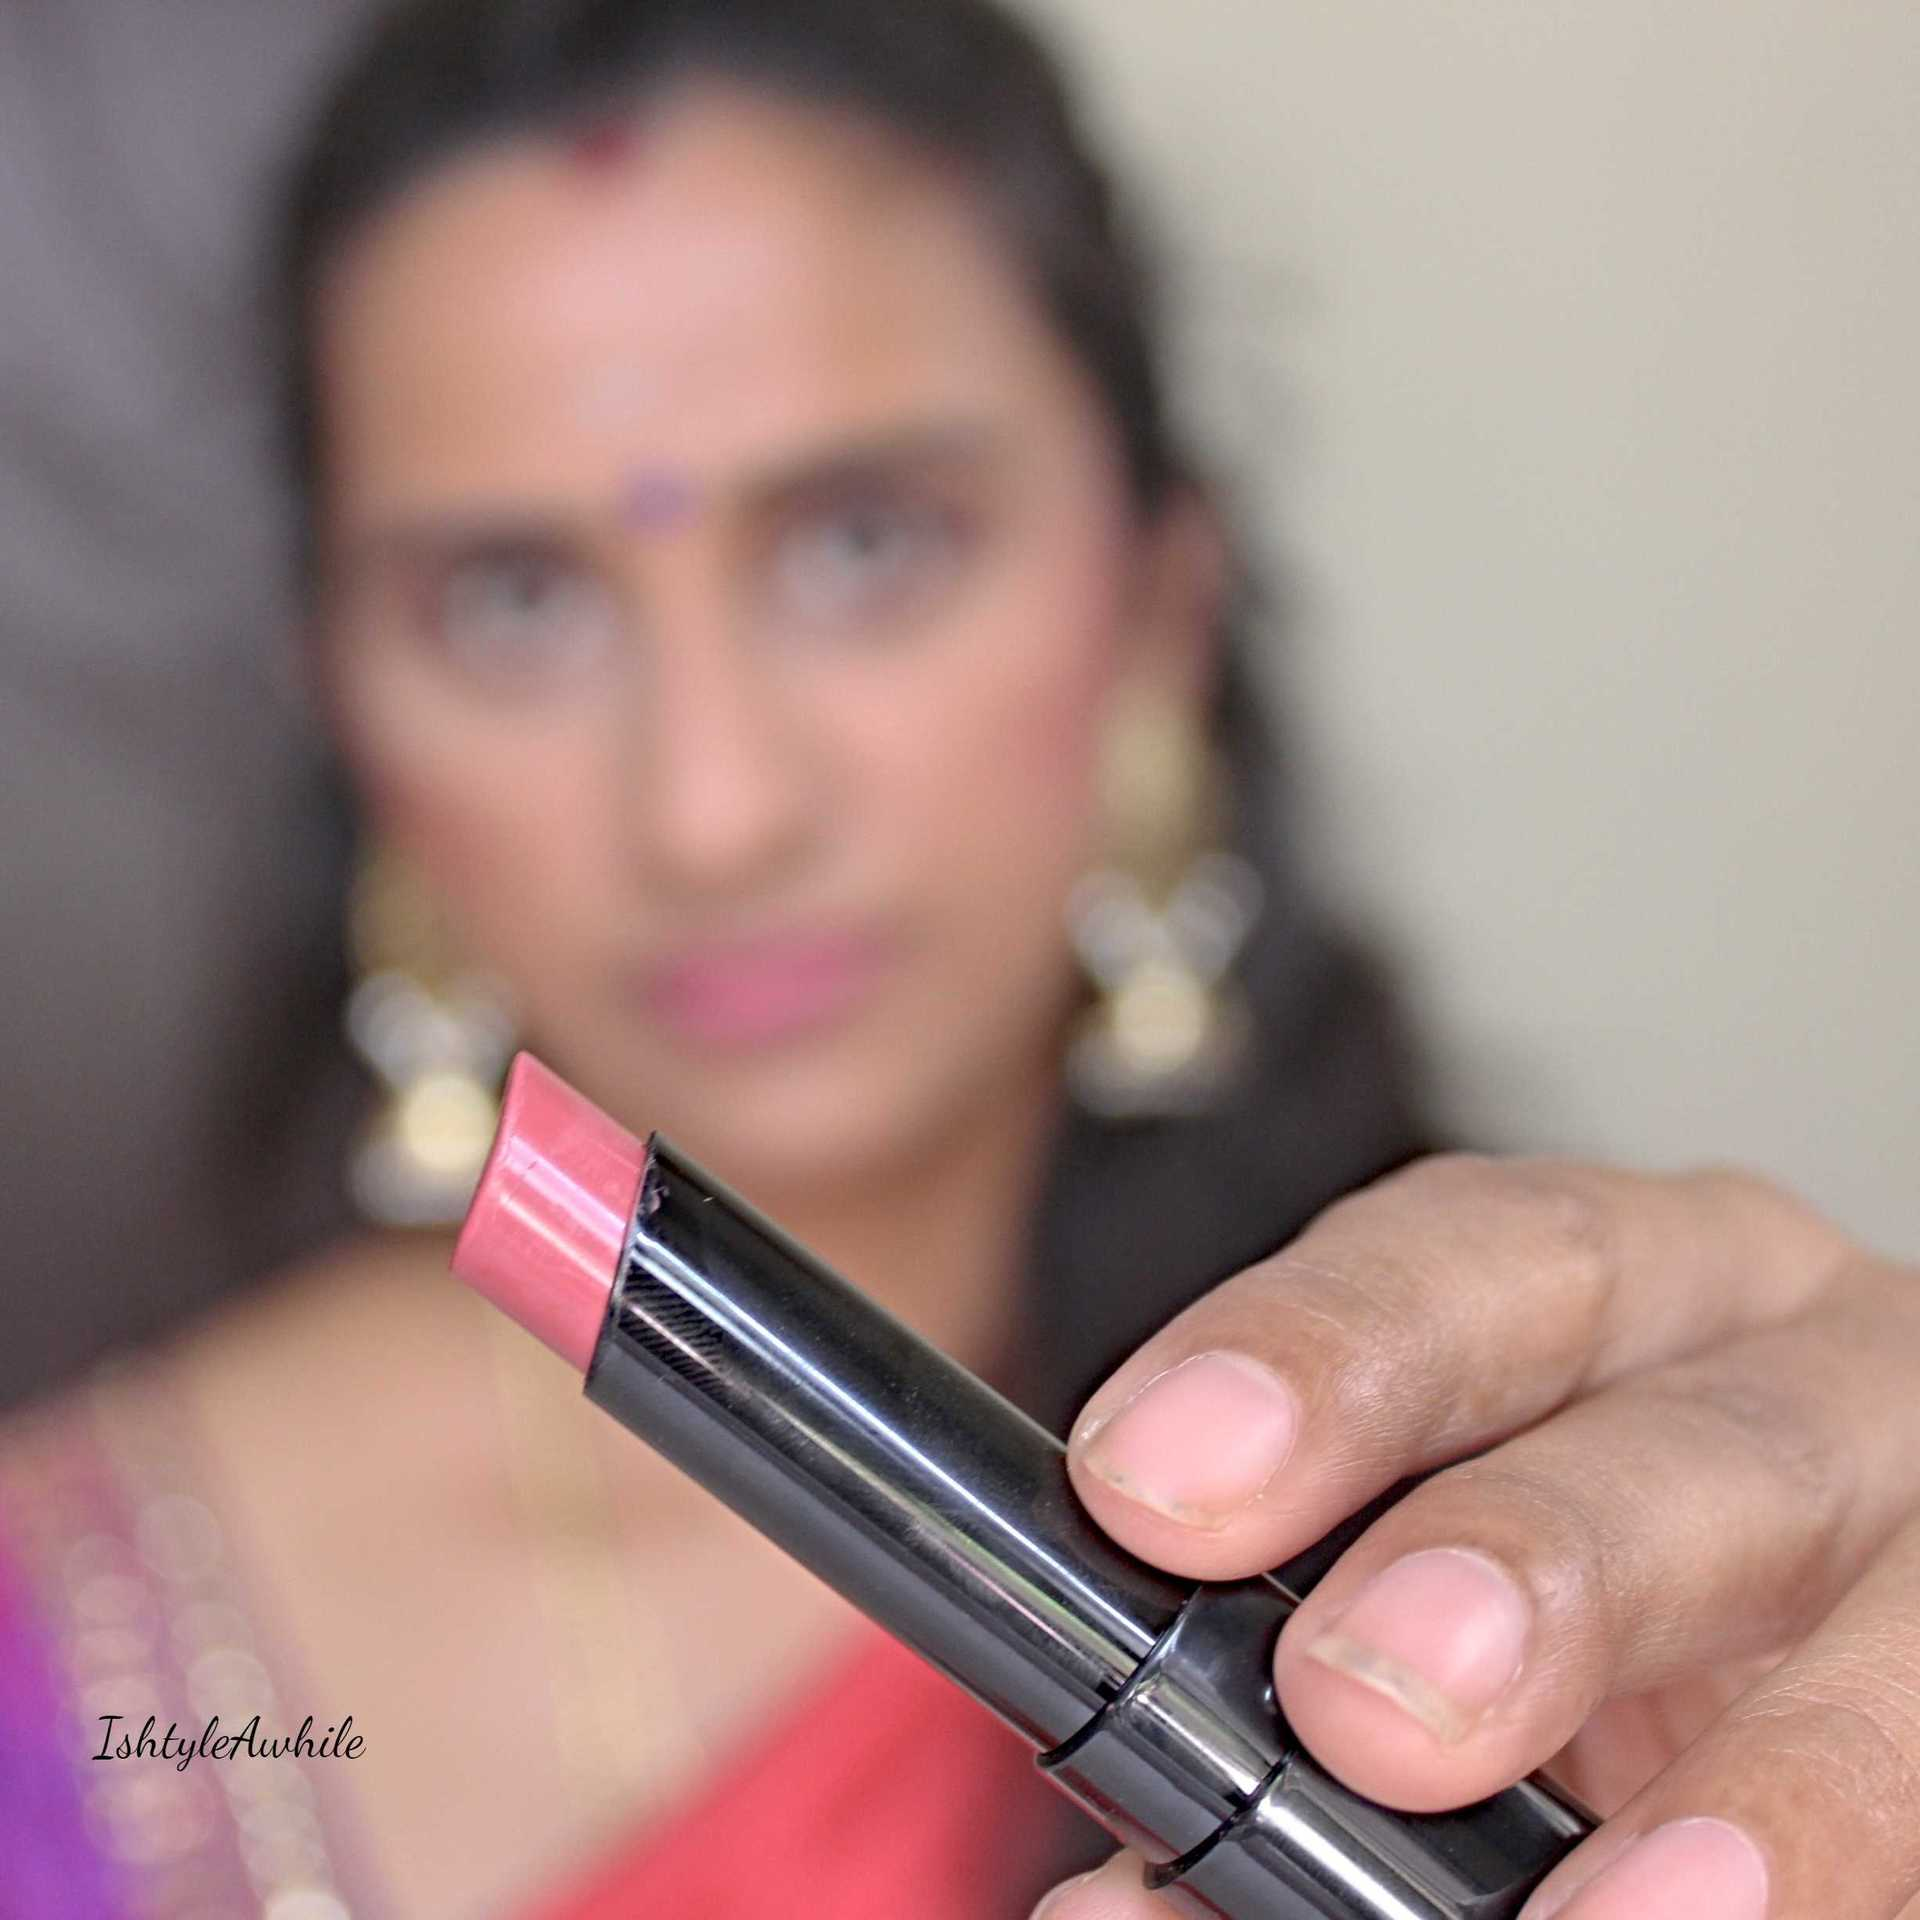 IshtyleAwhile - Spekta_Cosmetics Alpha Lipstick